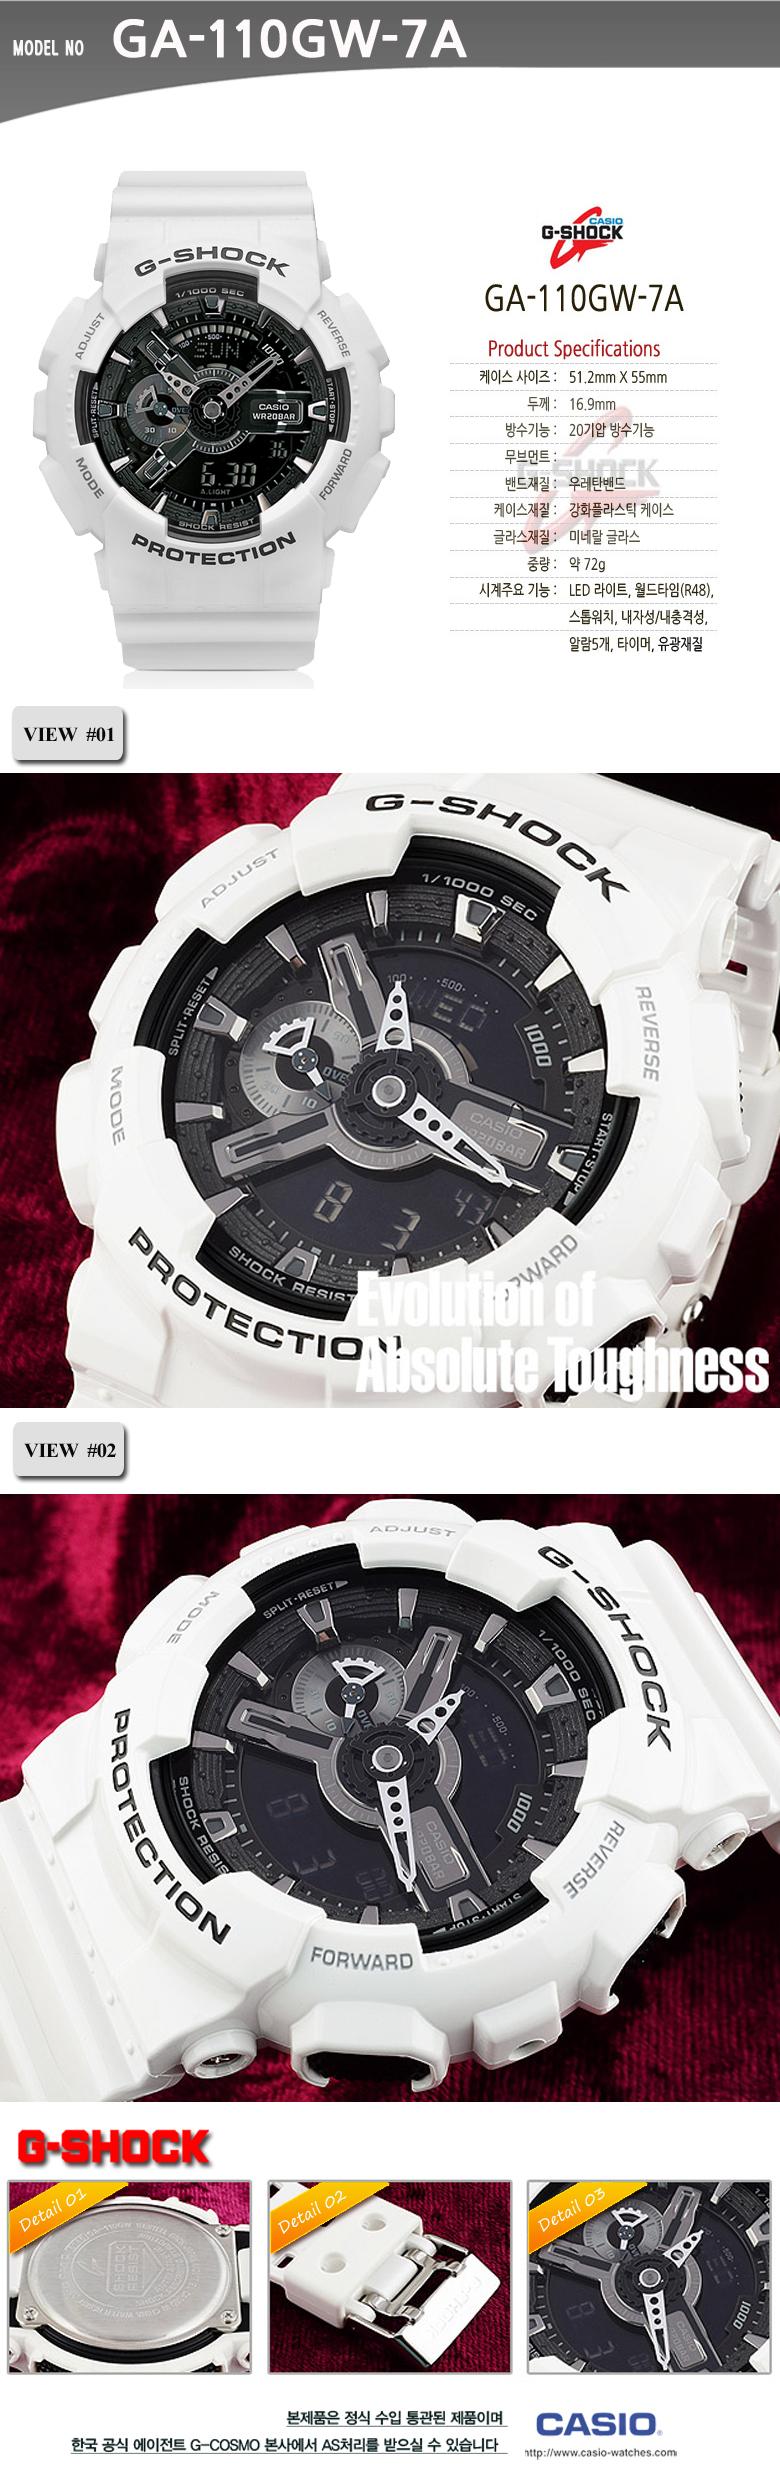 G Shock Multi Function Wristwatch Ga 110gw 7a 11street Casio Seller Information